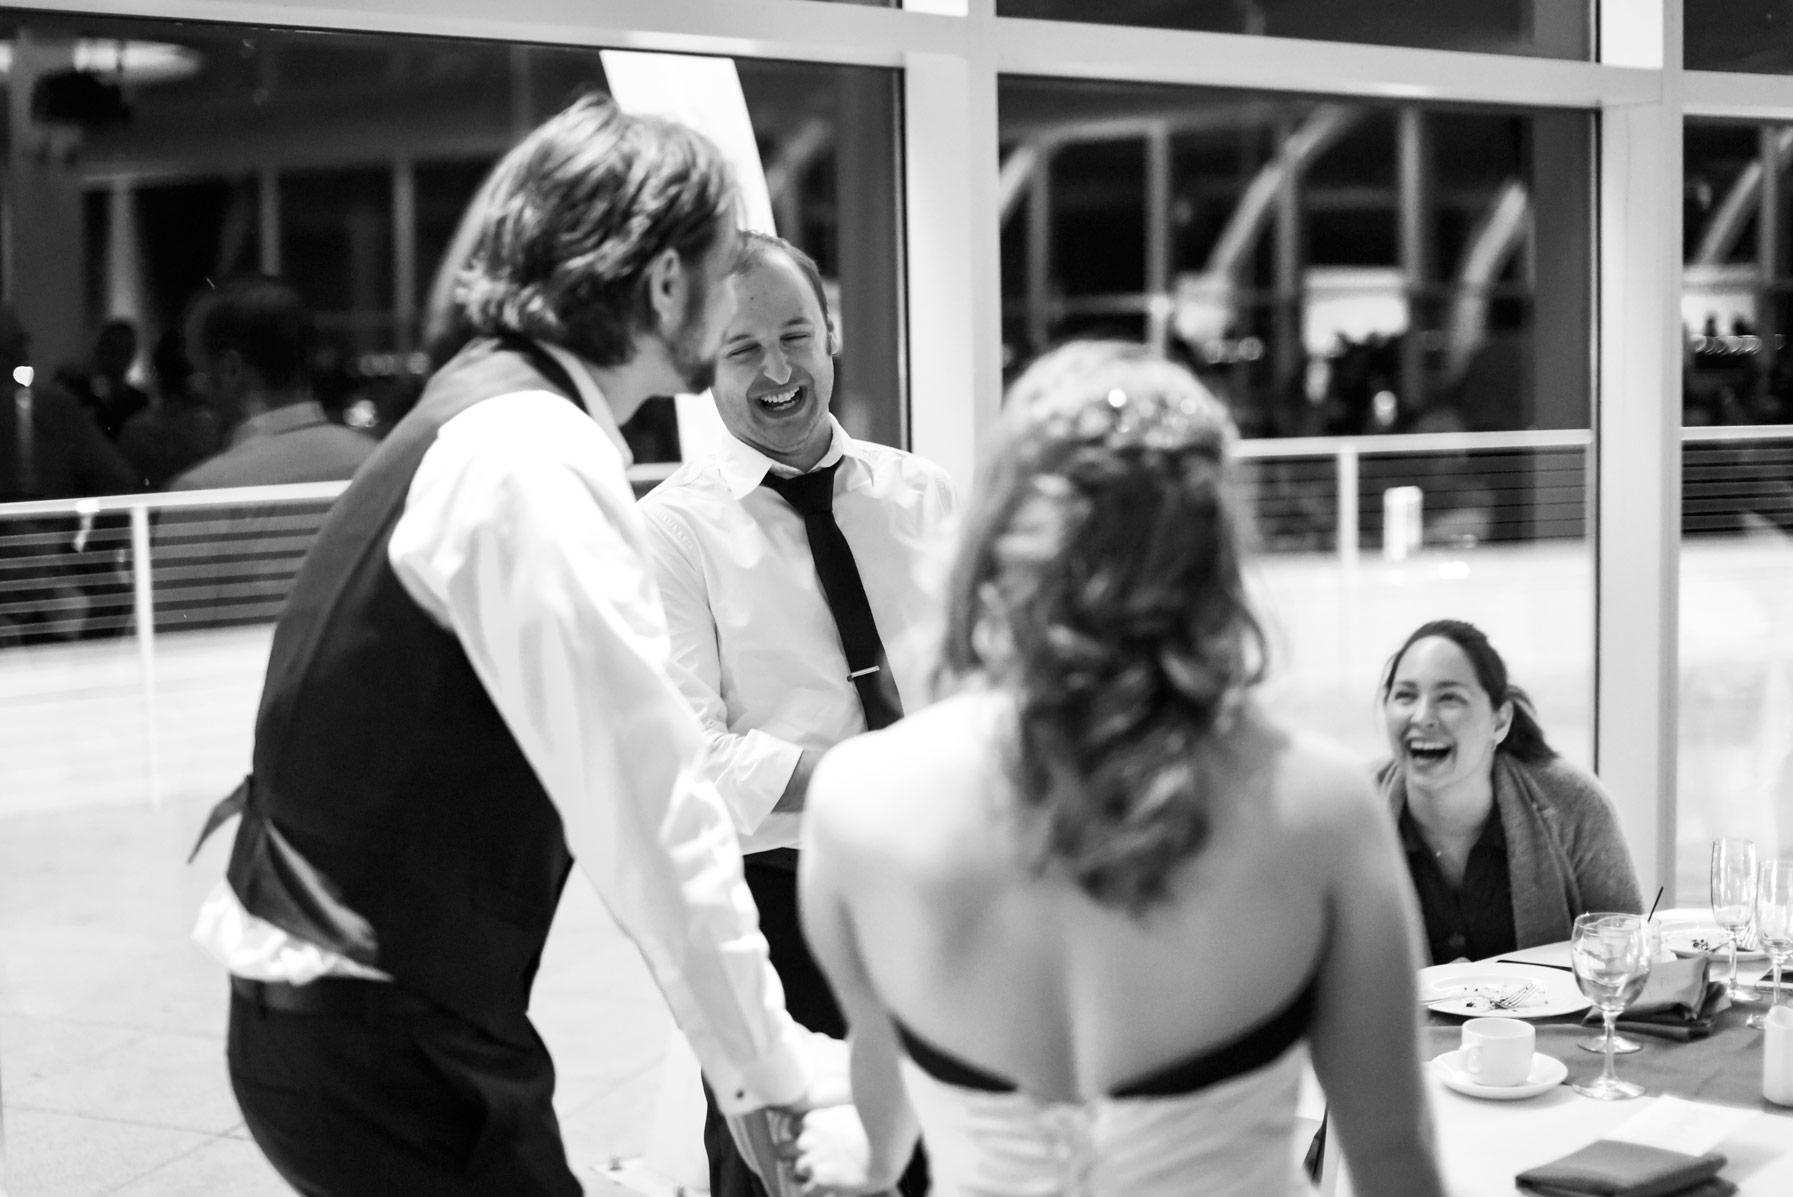 milwaukee-discovery-world-pier-wisconsin-wedding-ruthie-hauge-photography-60.jpg